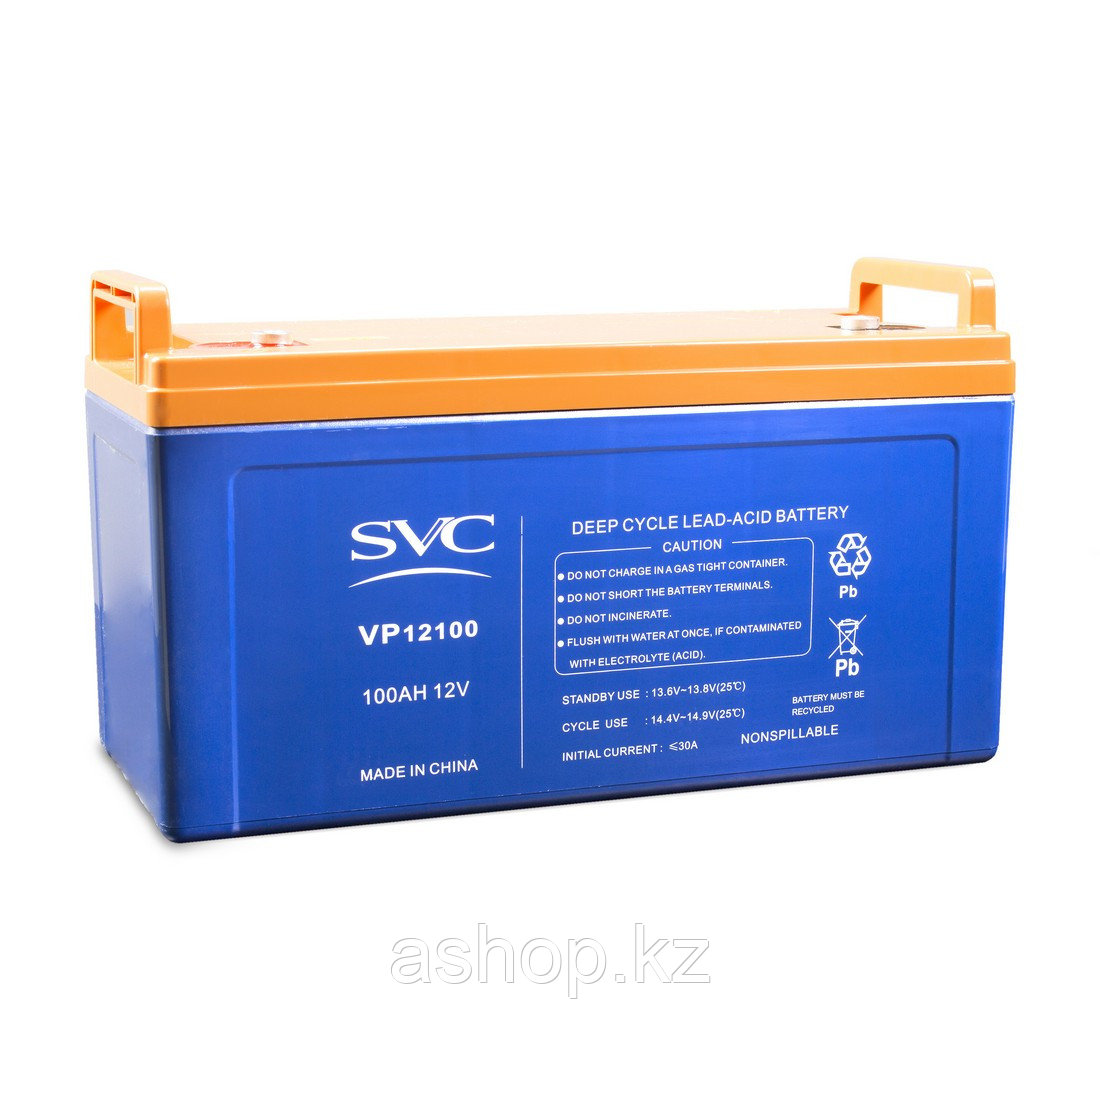 Батарея необслуживаемая (аккумулятор) SVC VP 12100 (12V 100 Ah), Емкость аккумулятора: 100 Ah, Разъемы: F5/F12